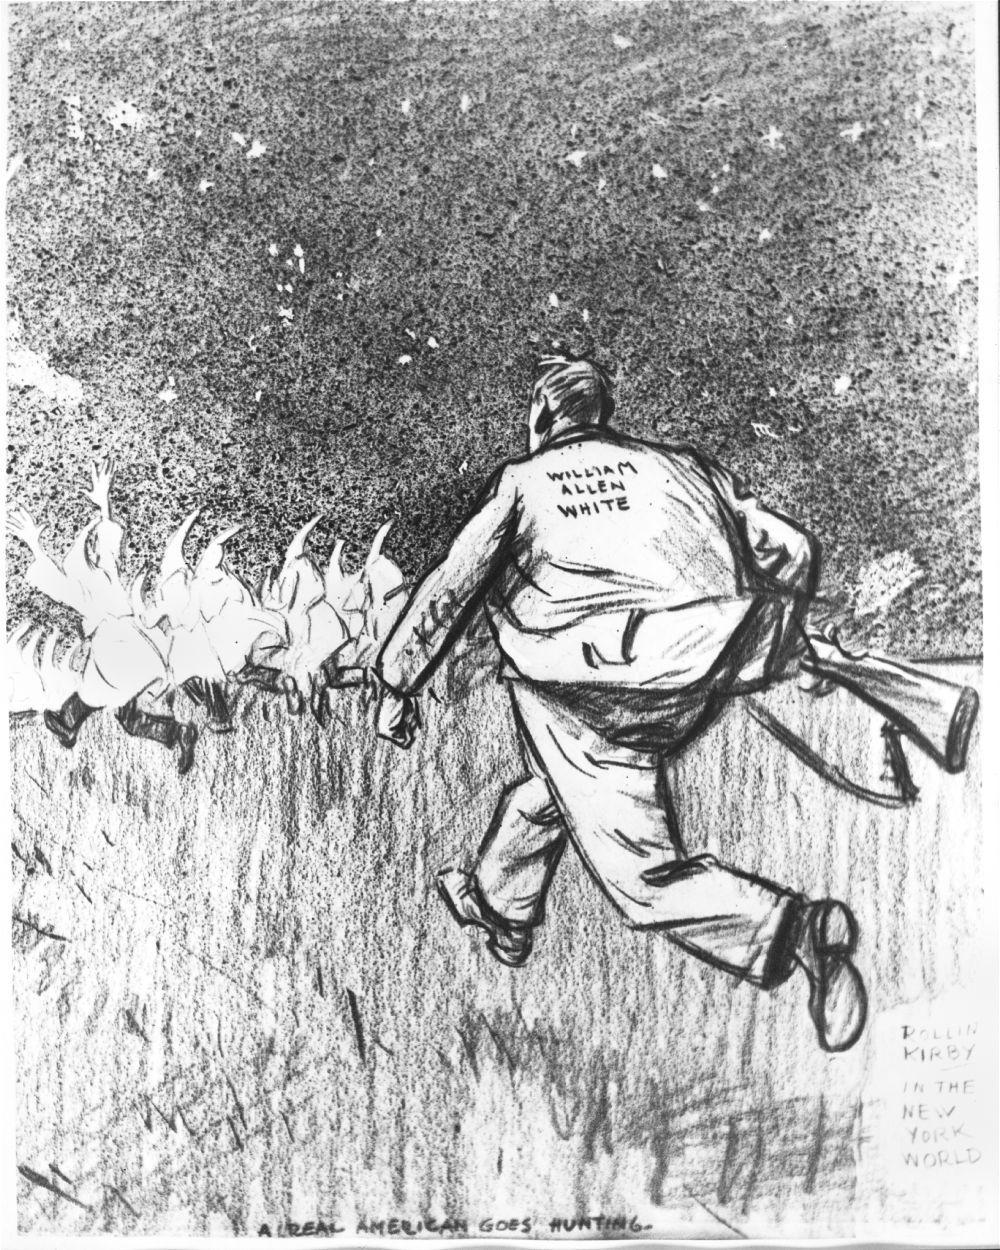 William Allen White campaign cartoon